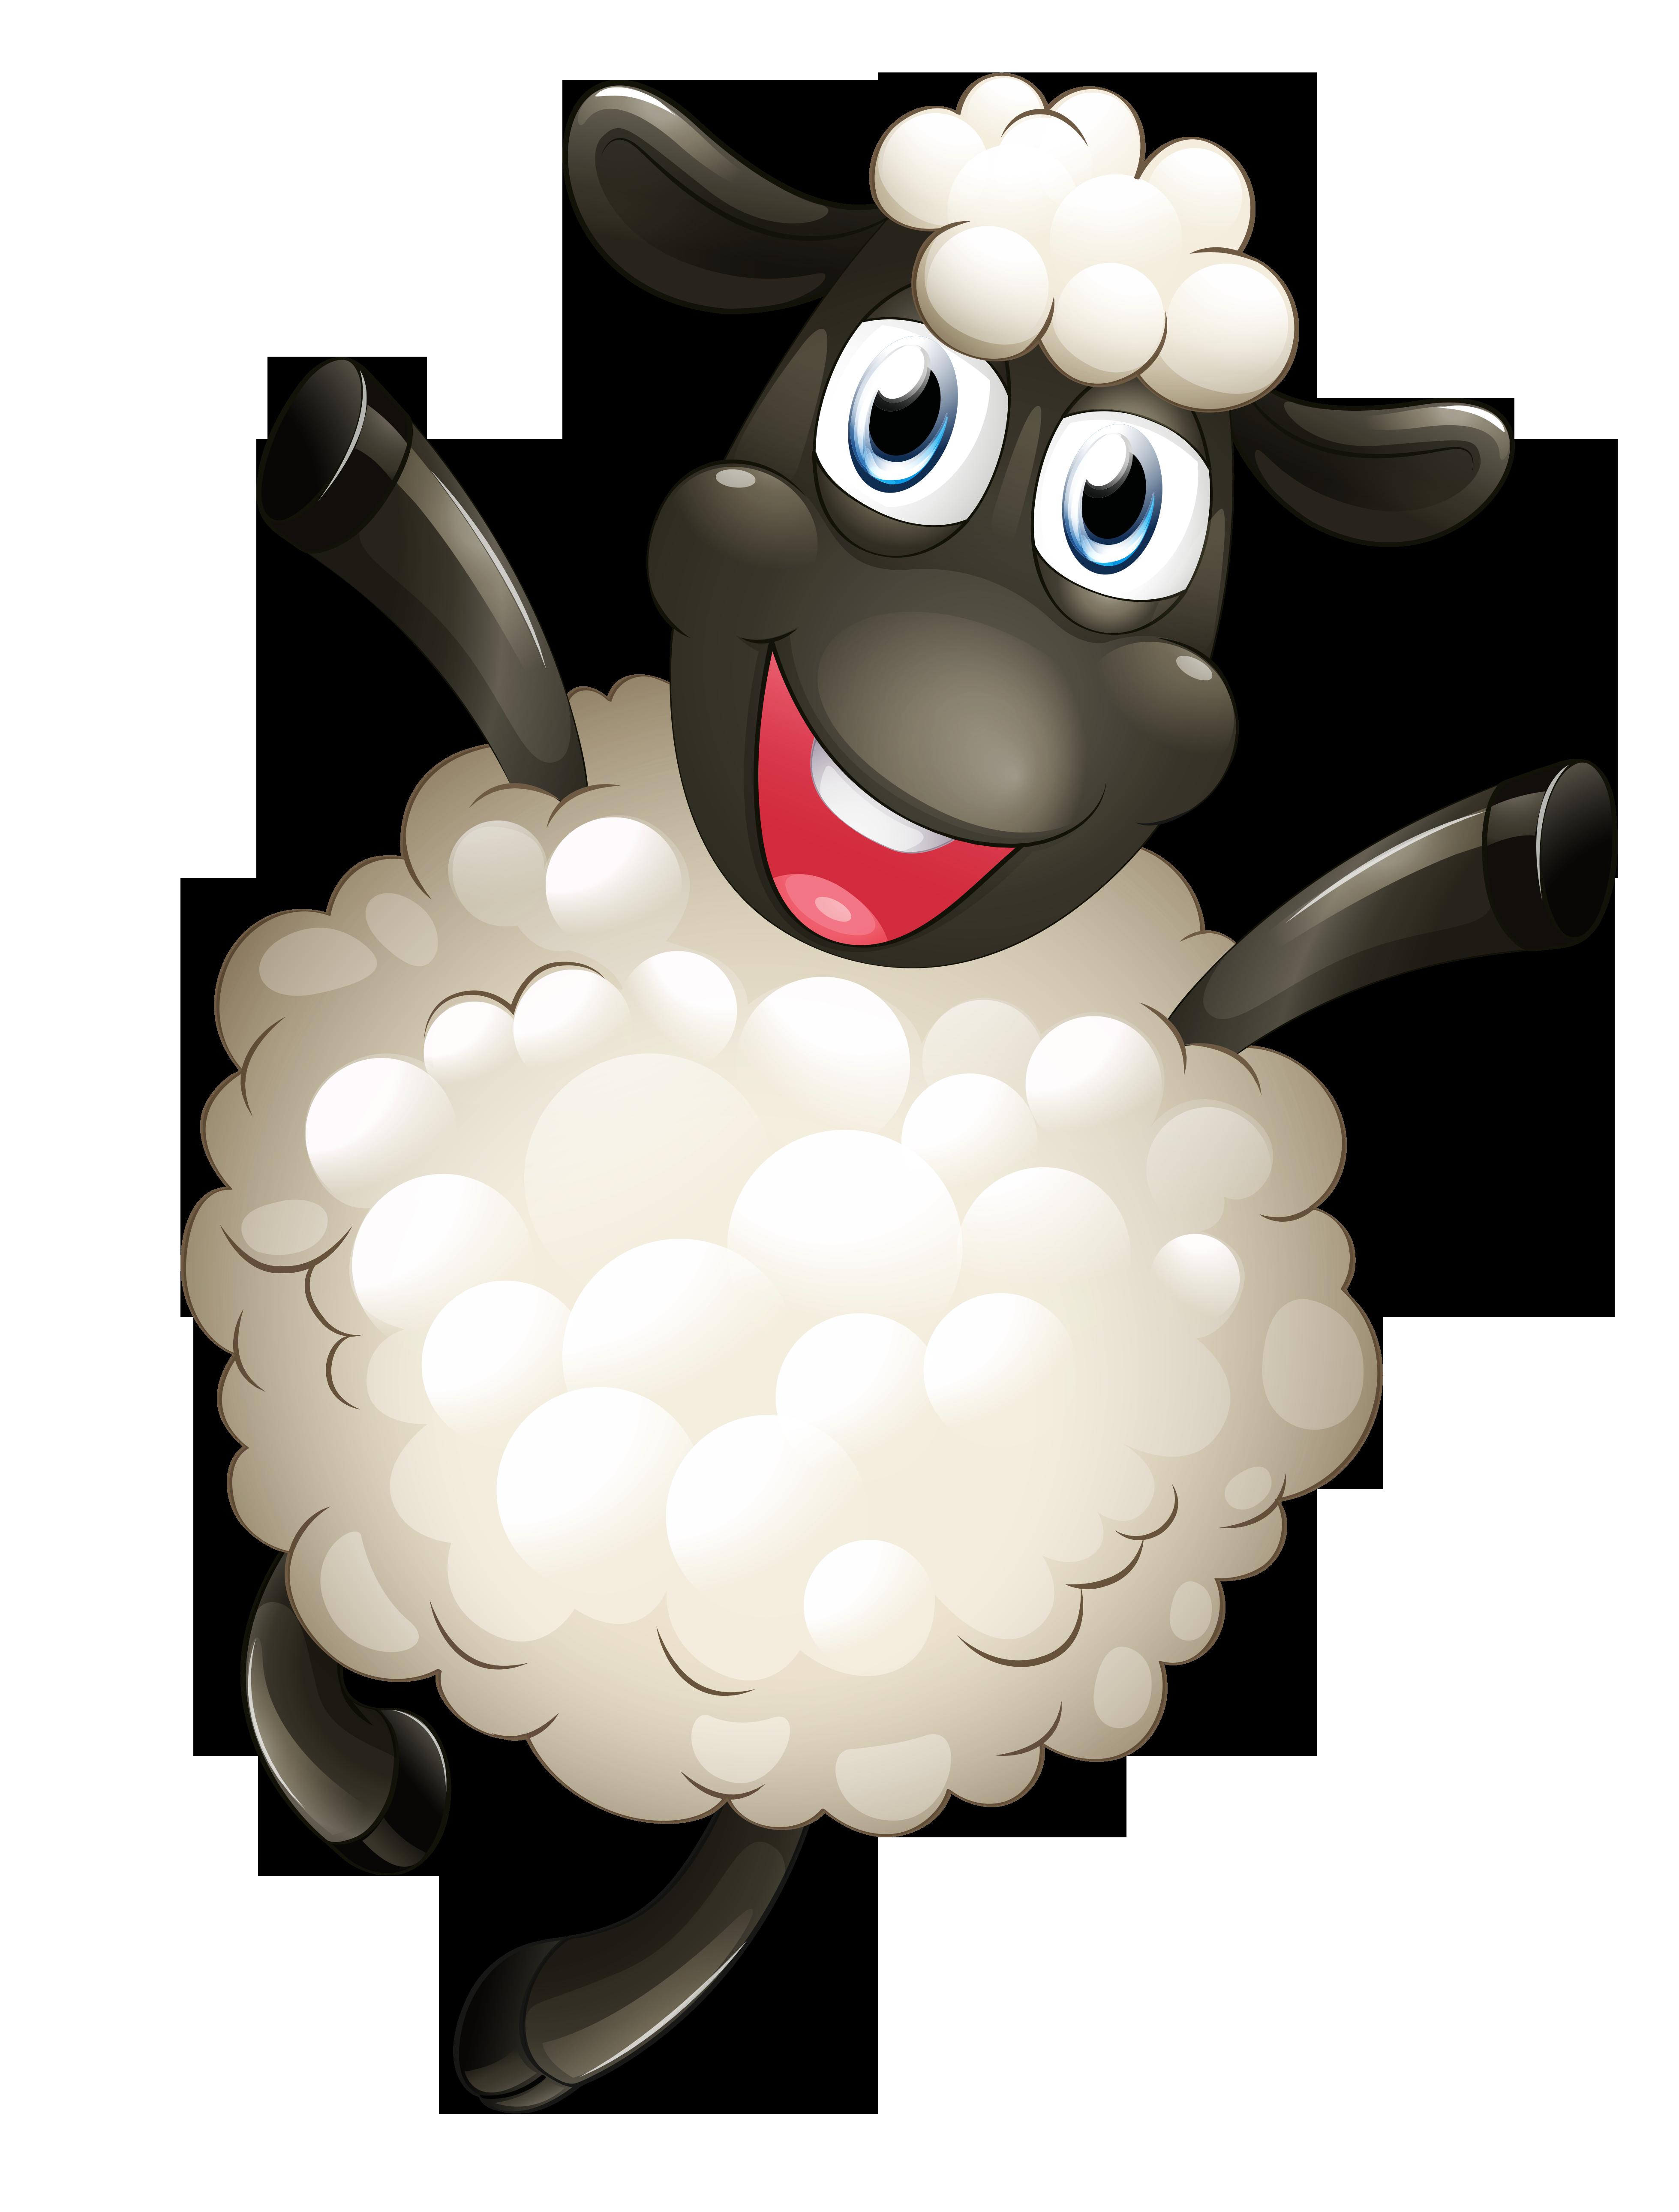 Sheep clipart animation, Sheep animation Transparent FREE ...